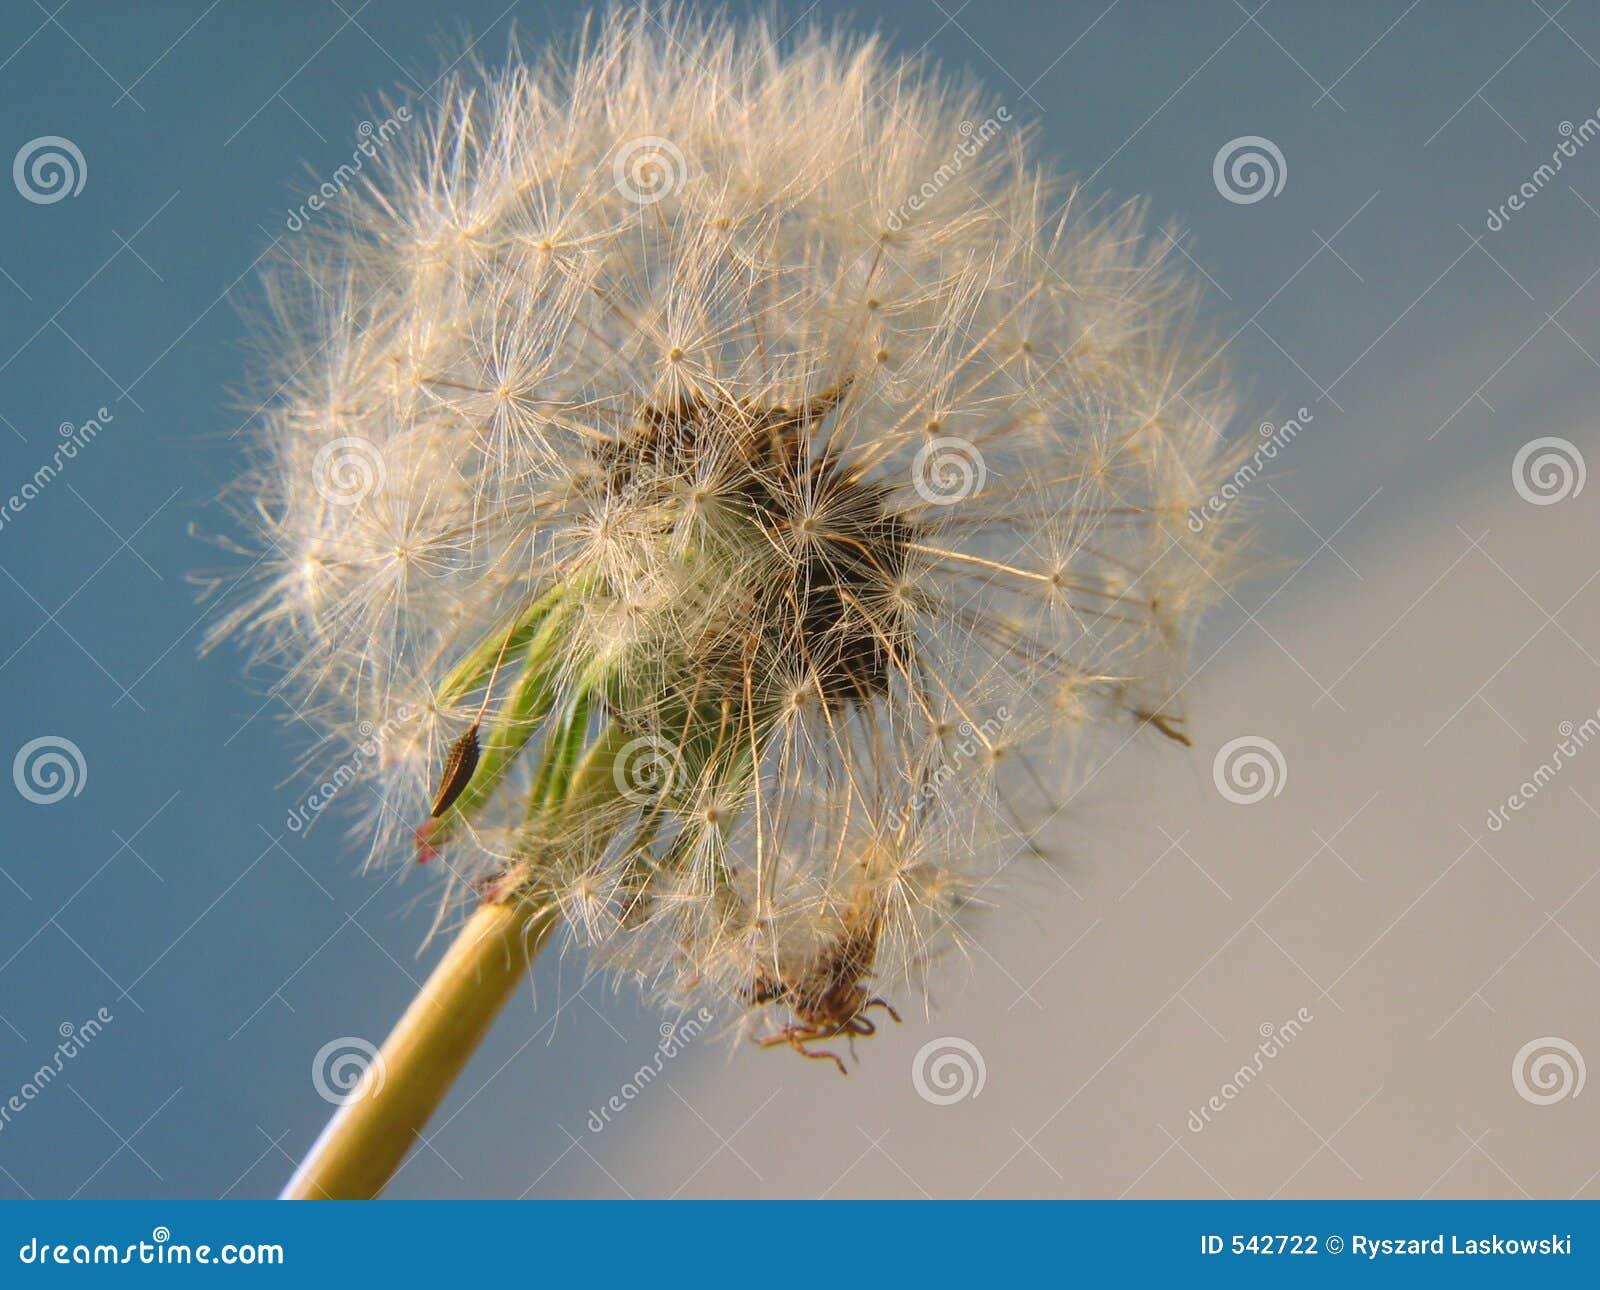 blow ball stock photo image of macro fluff flowers wind 542722